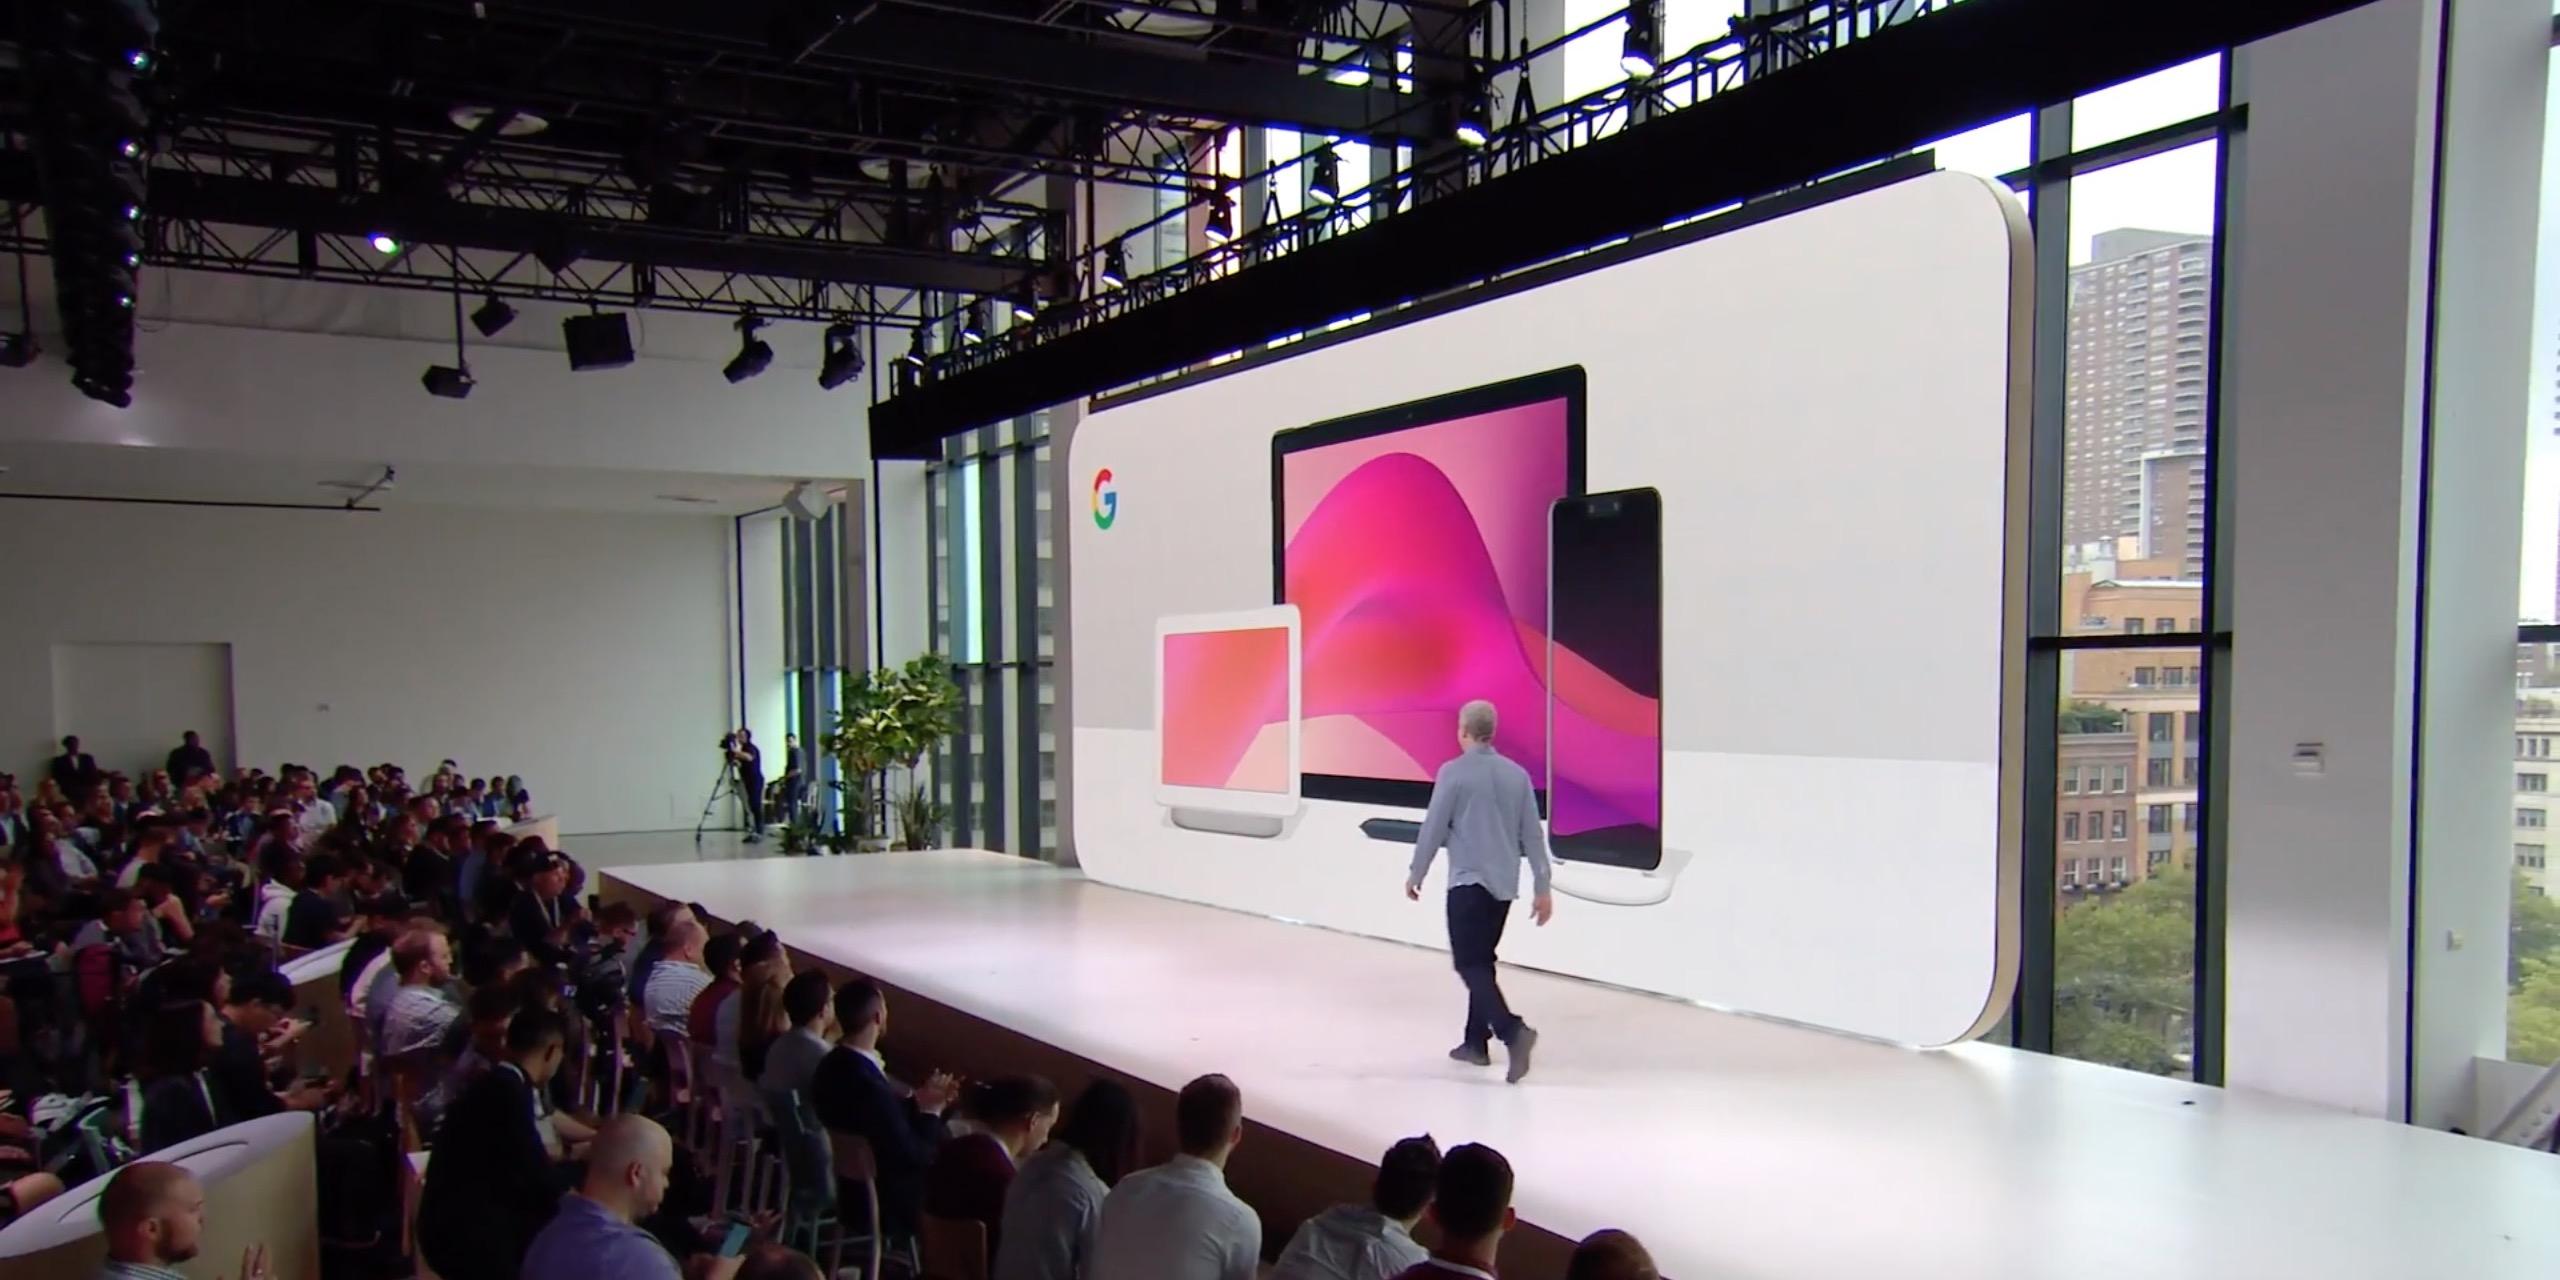 Google Store Black Friday starts this week: Pixel 3 BOGO 50% off, $99 Home Hub, $300 off Pixelbook, much more